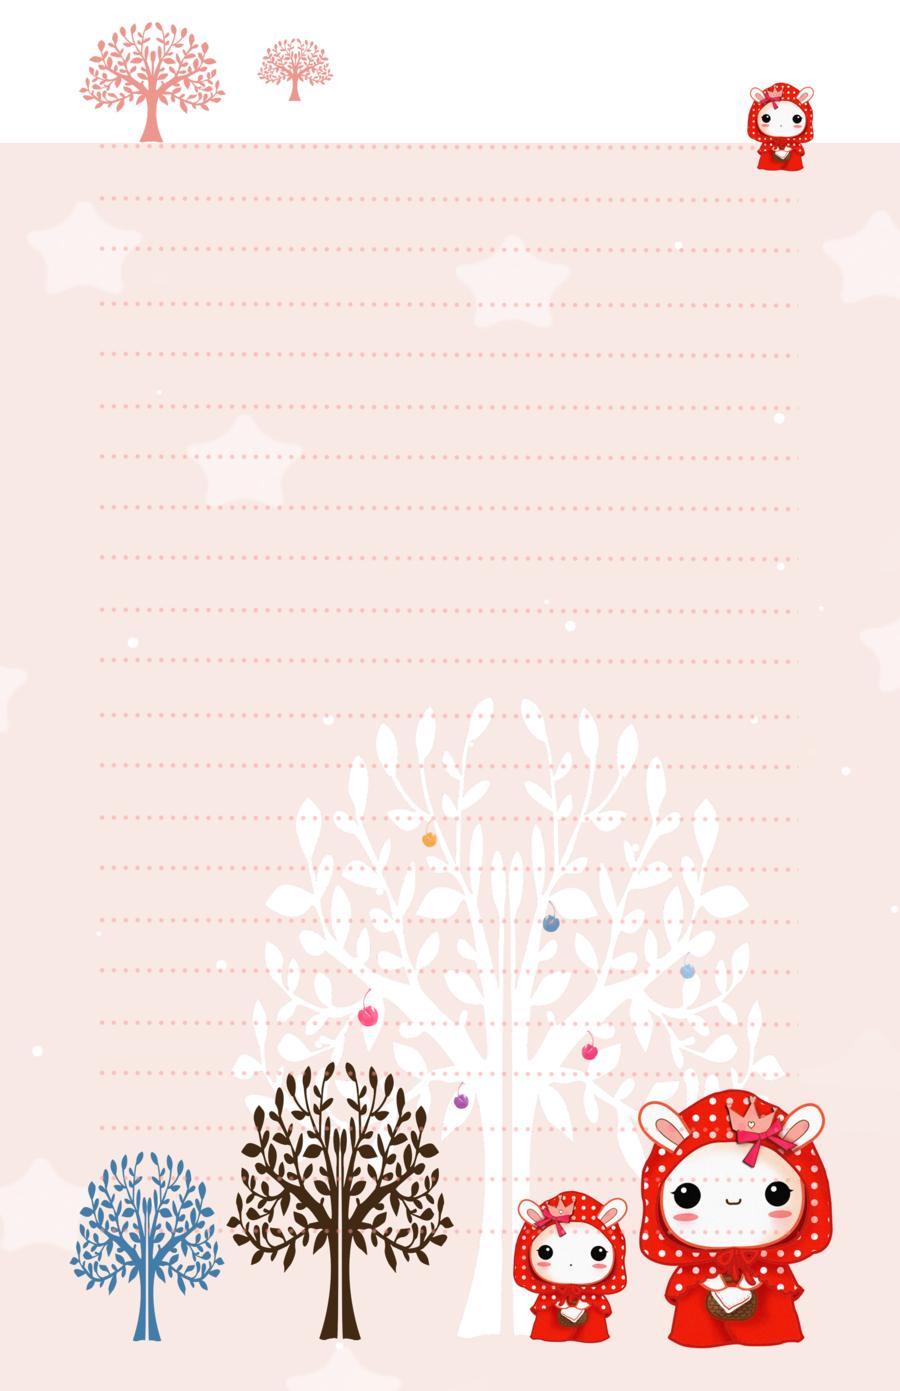 Kawaii red hood bunnies - stationery by tho-be.deviantart.com on @deviantART